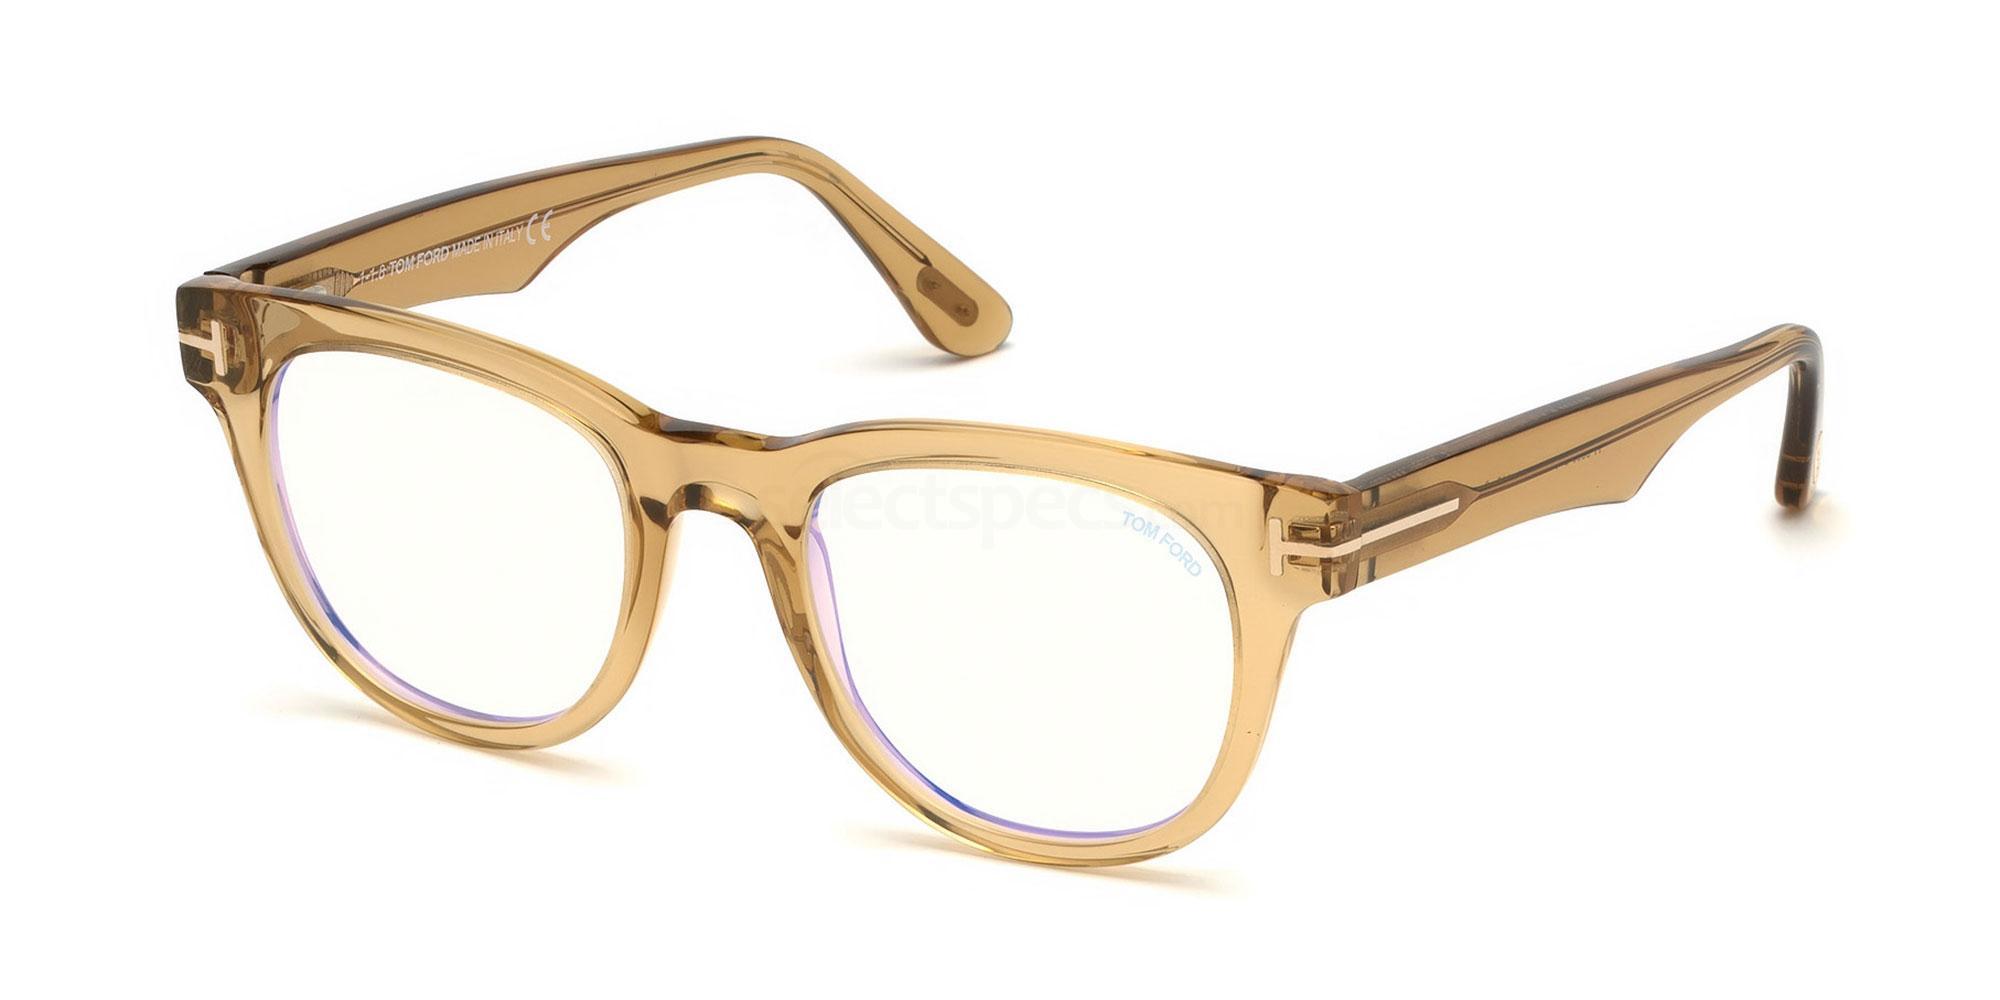 AW20 eyewear trends transparent glasses warm tones tom ford